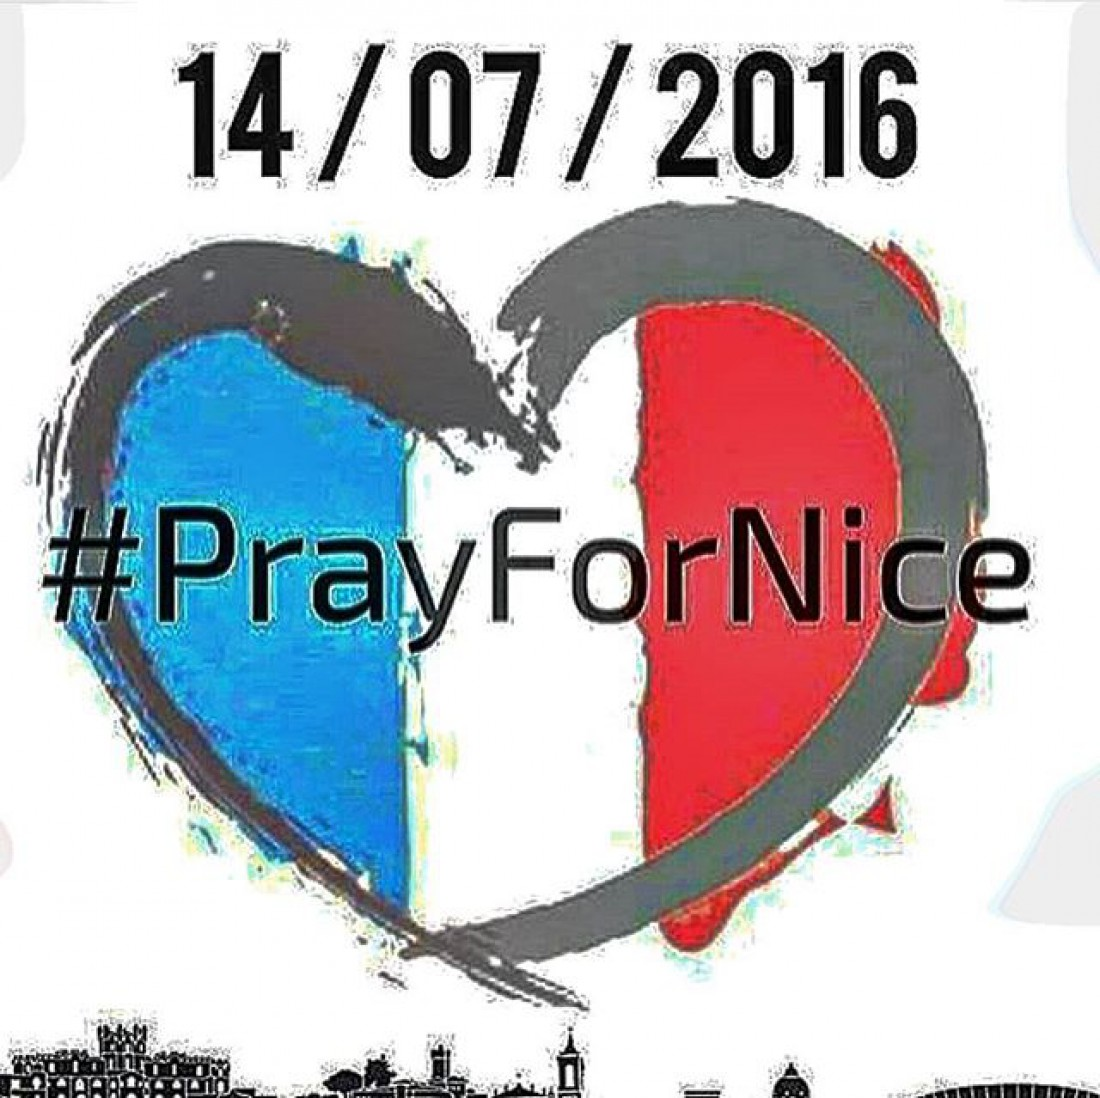 Теракт в Ницце: фото из соцсети Иосифа Пригожина